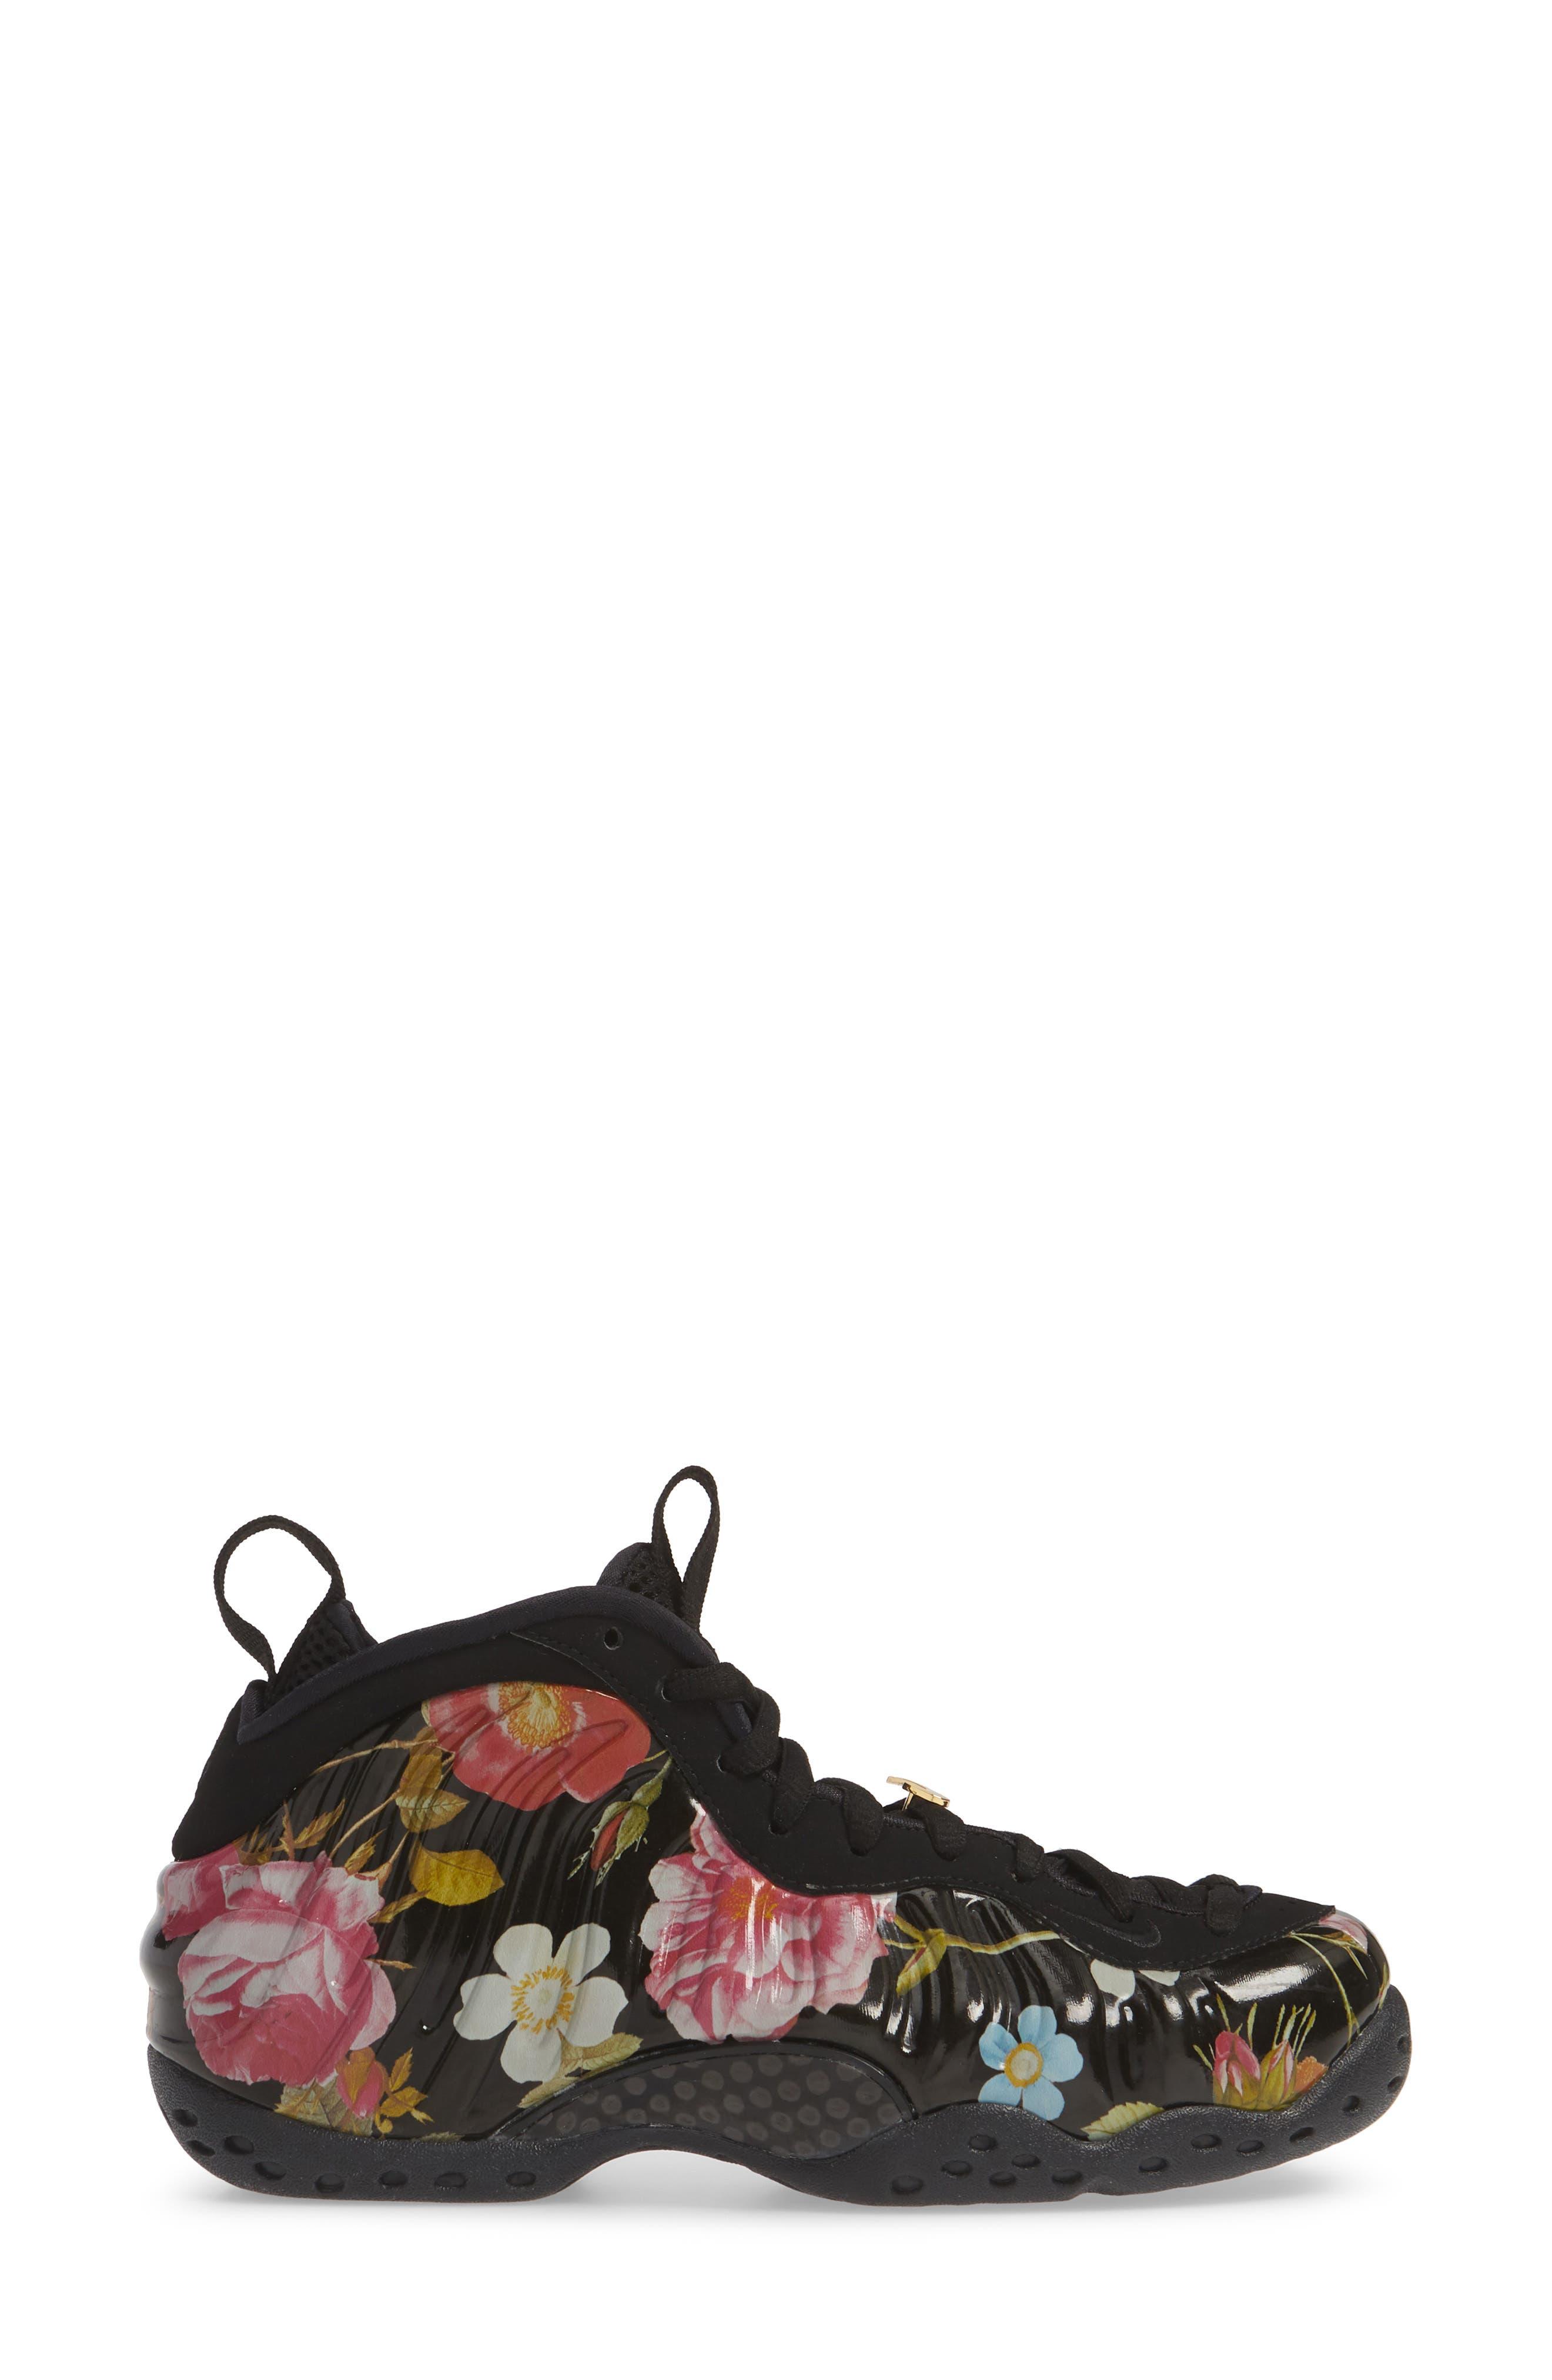 NIKE, Air Foamposite One Sneaker, Alternate thumbnail 3, color, BLACK/ BLACK-METALLIC GOLD